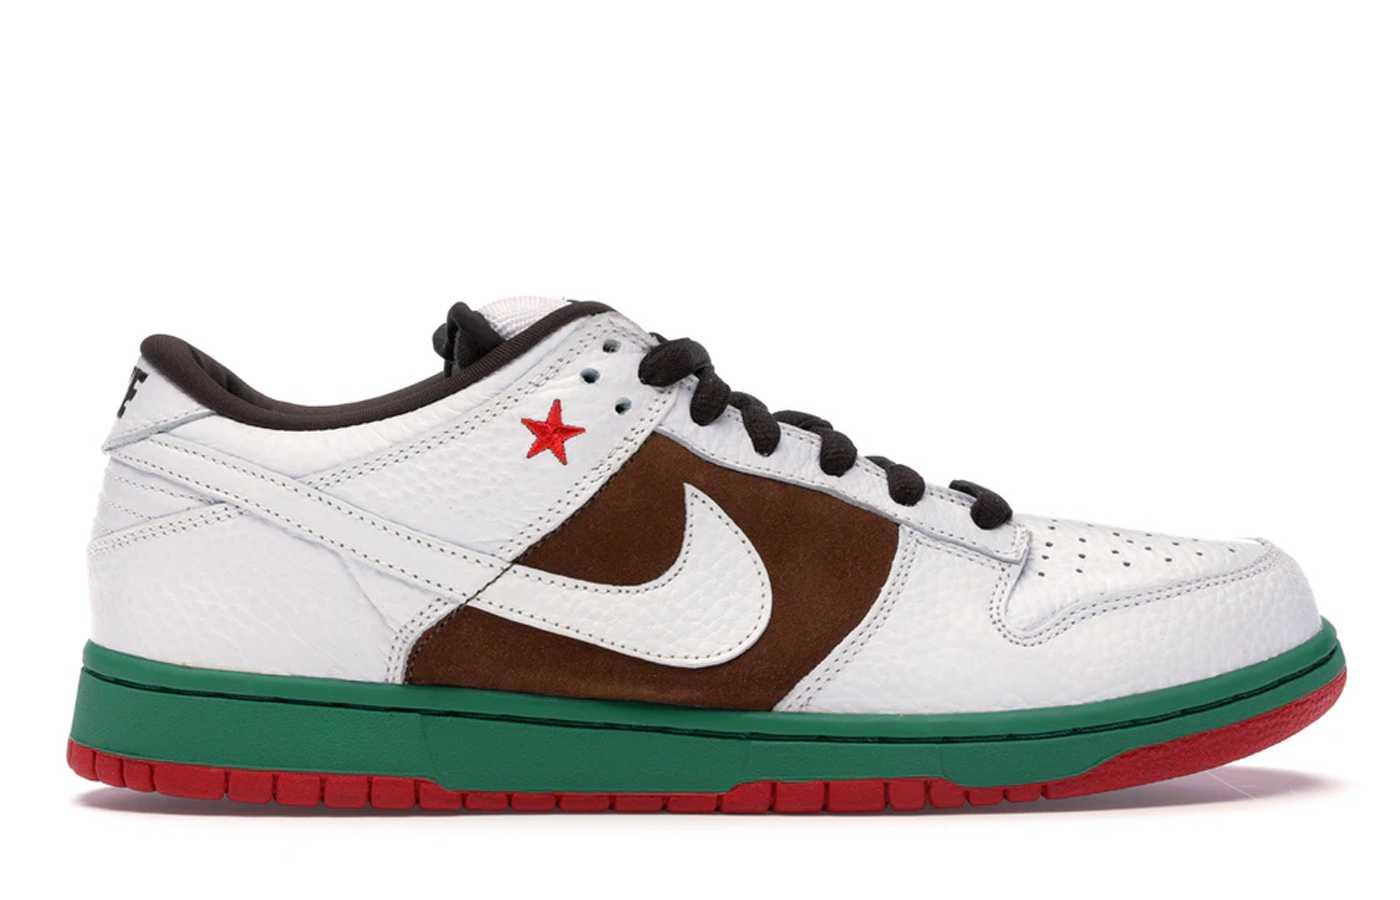 Nike Dunk SB Low Cali